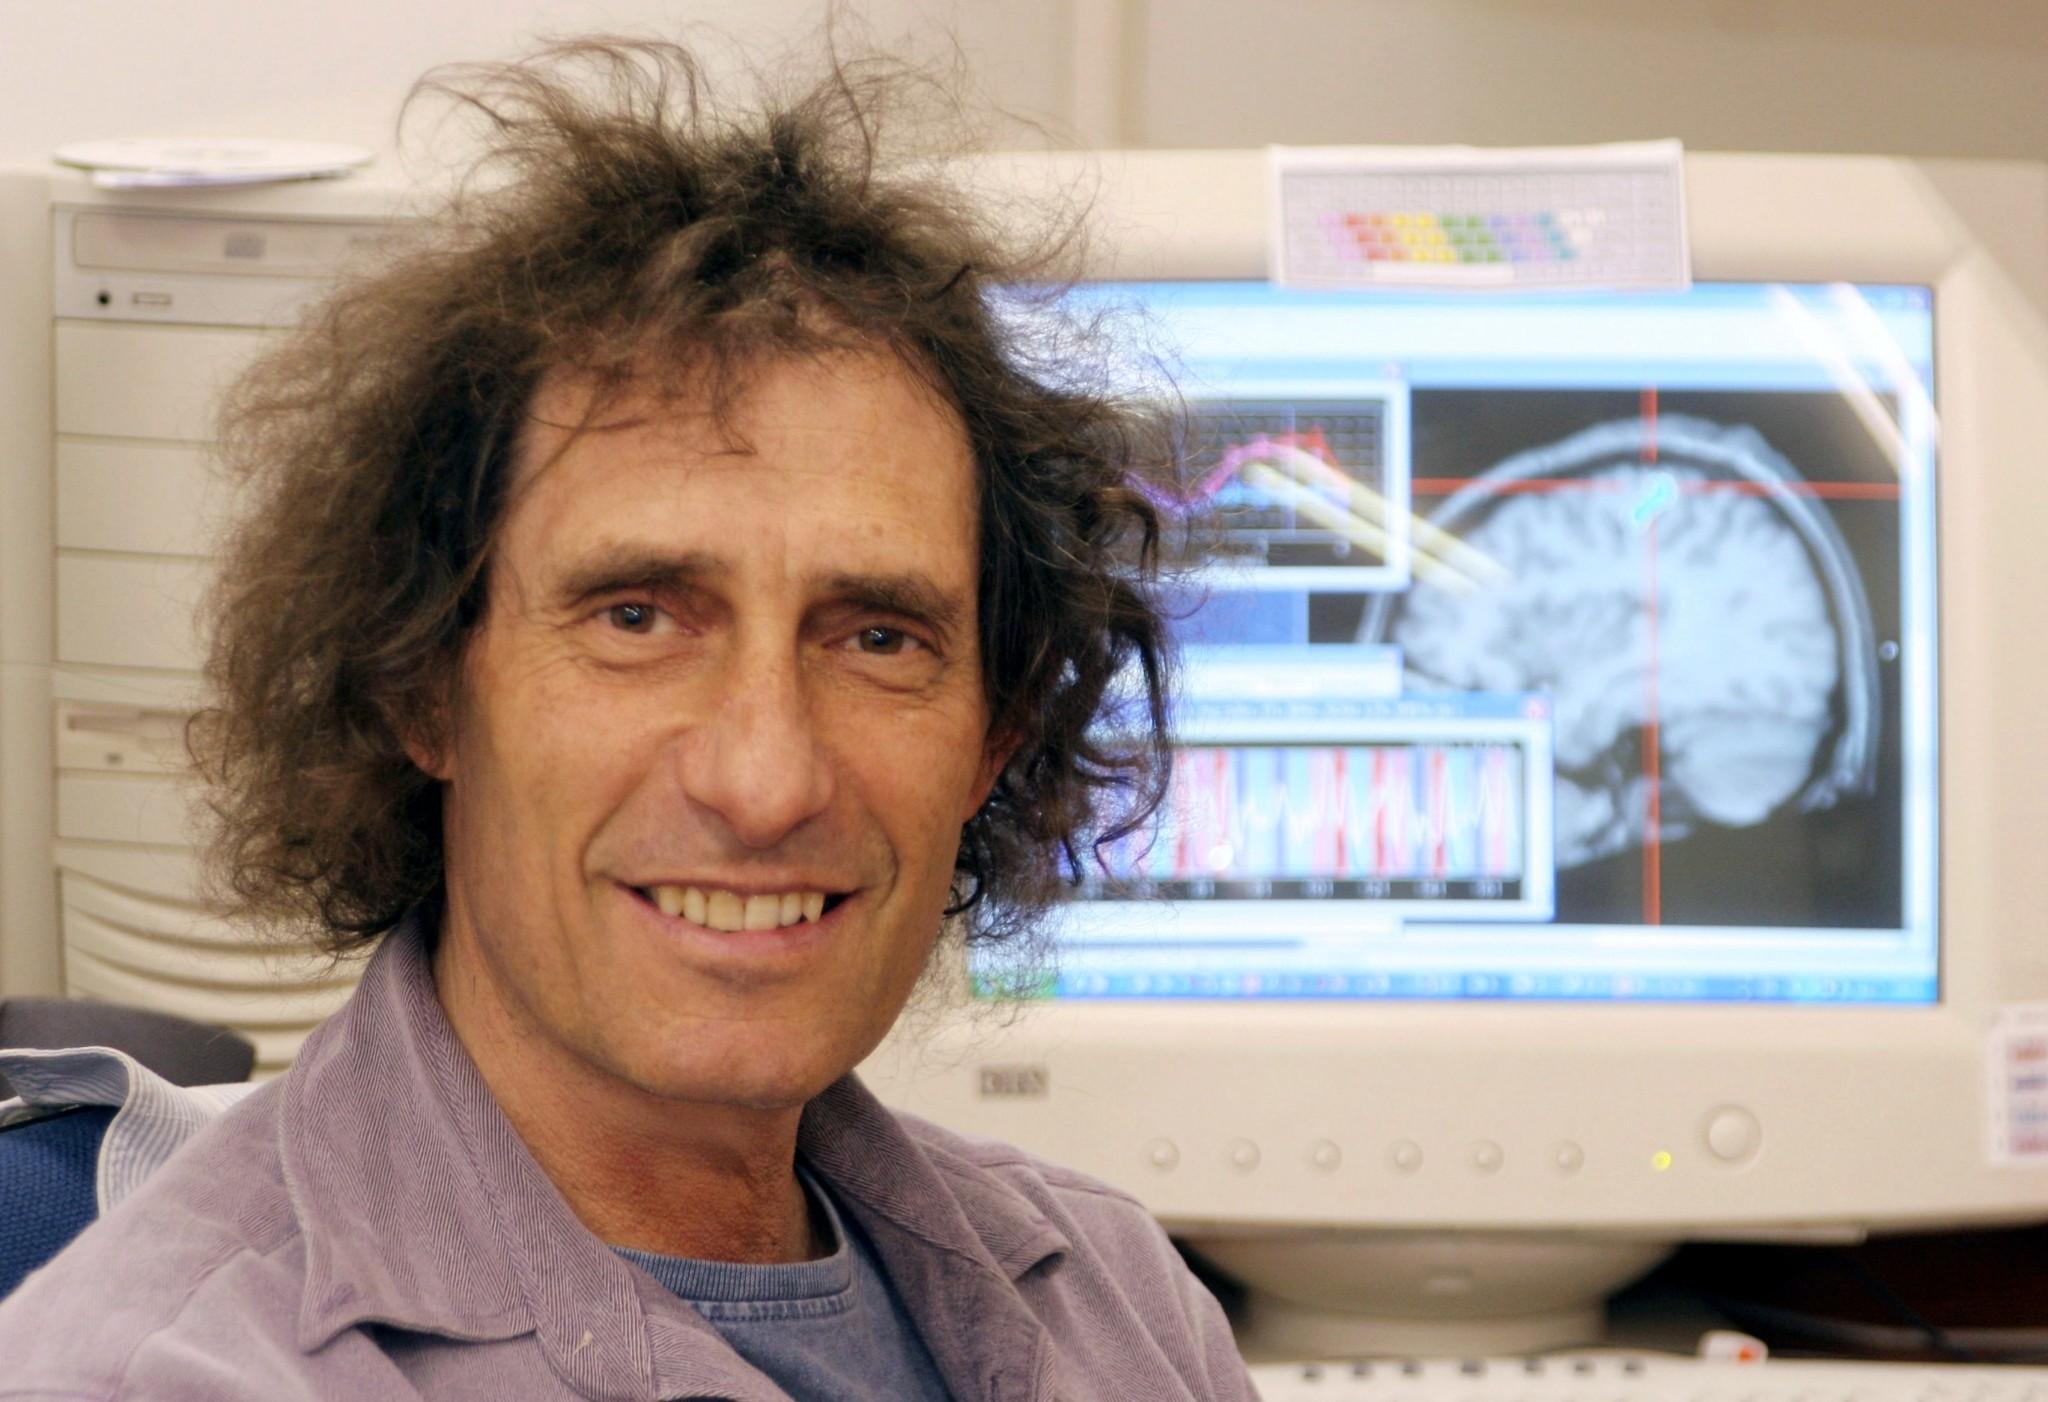 Idan segev of the hebrew universitys edmond and lily safra center for brain sciences